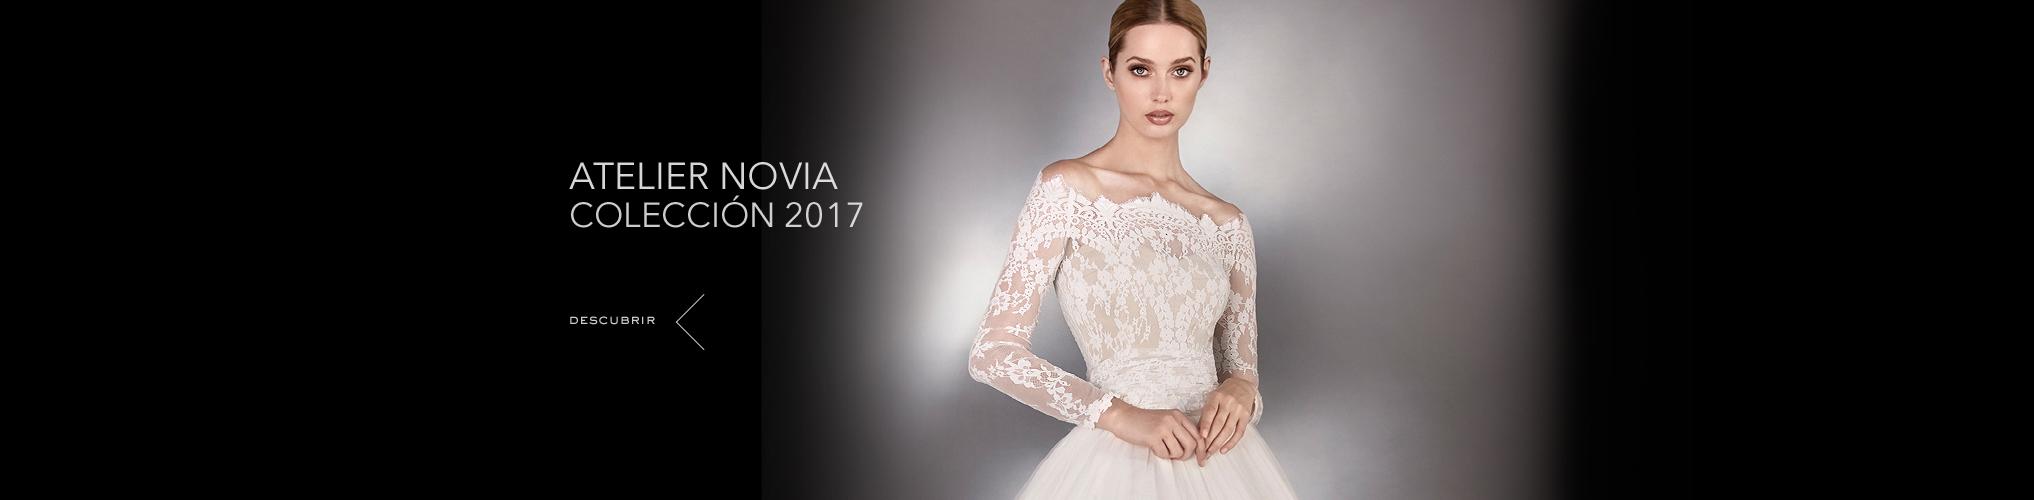 Atelier Novia - Colección 2017